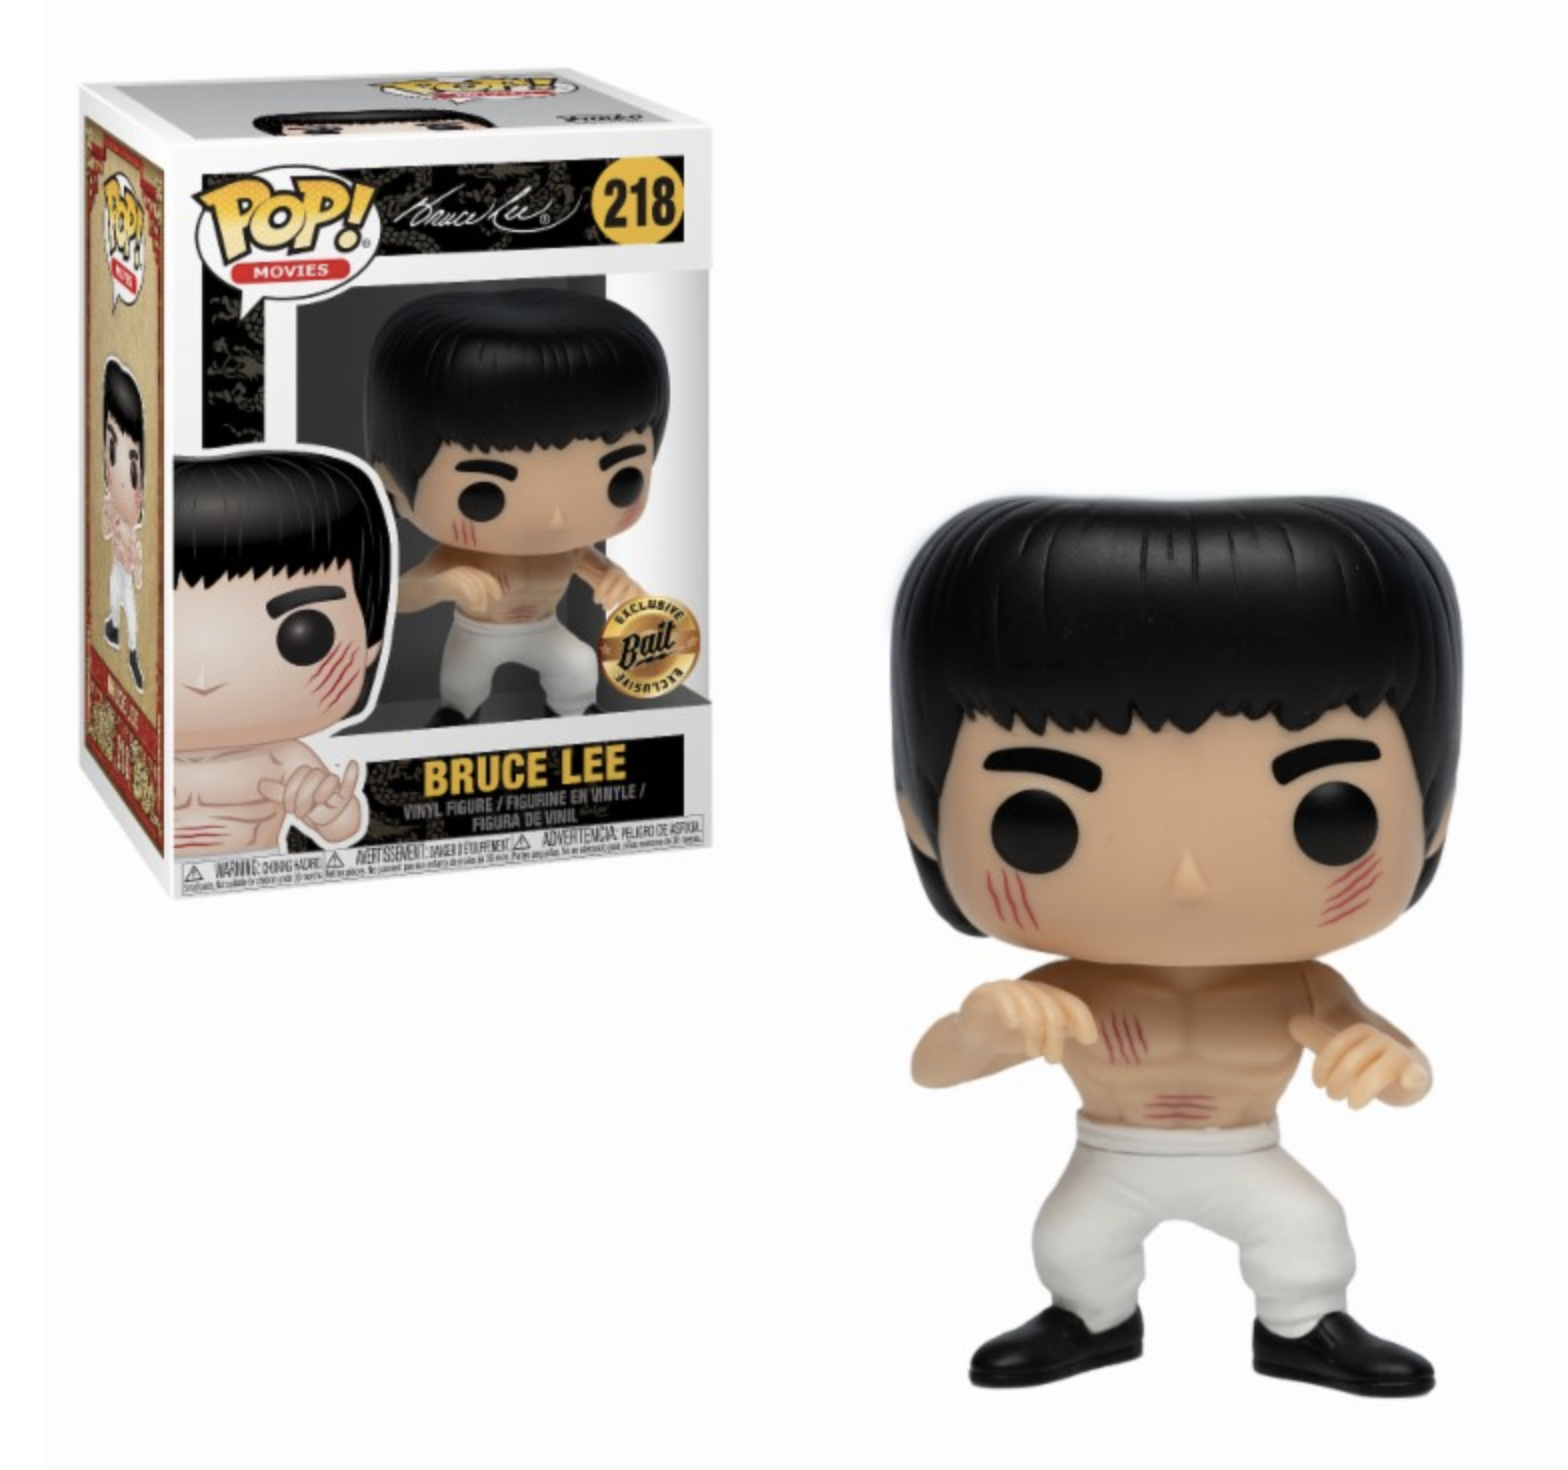 POP! Movies: Bruce Lee - White Pants Bruce Lee Edição Limitada